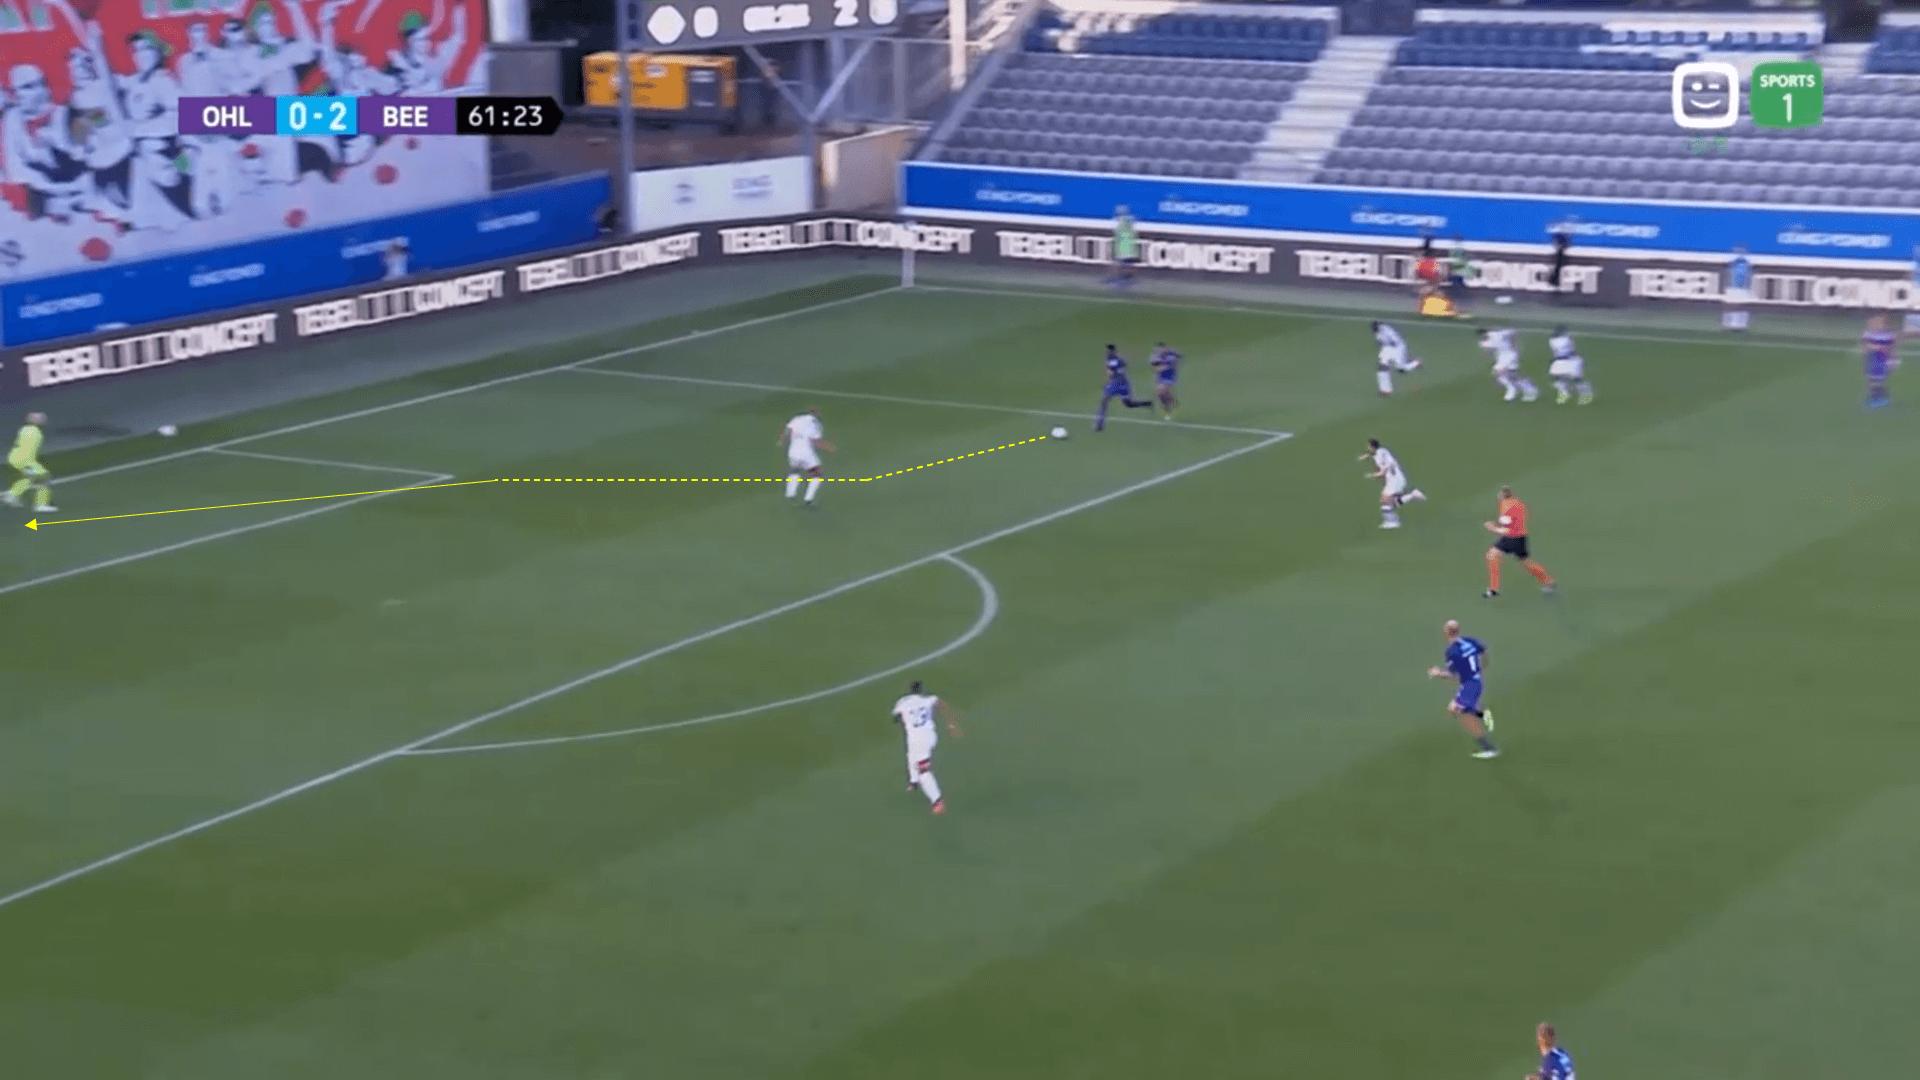 Proximus League Play Off - OH Leuven v Beerschot Wilrijk - tactical analysis tactics